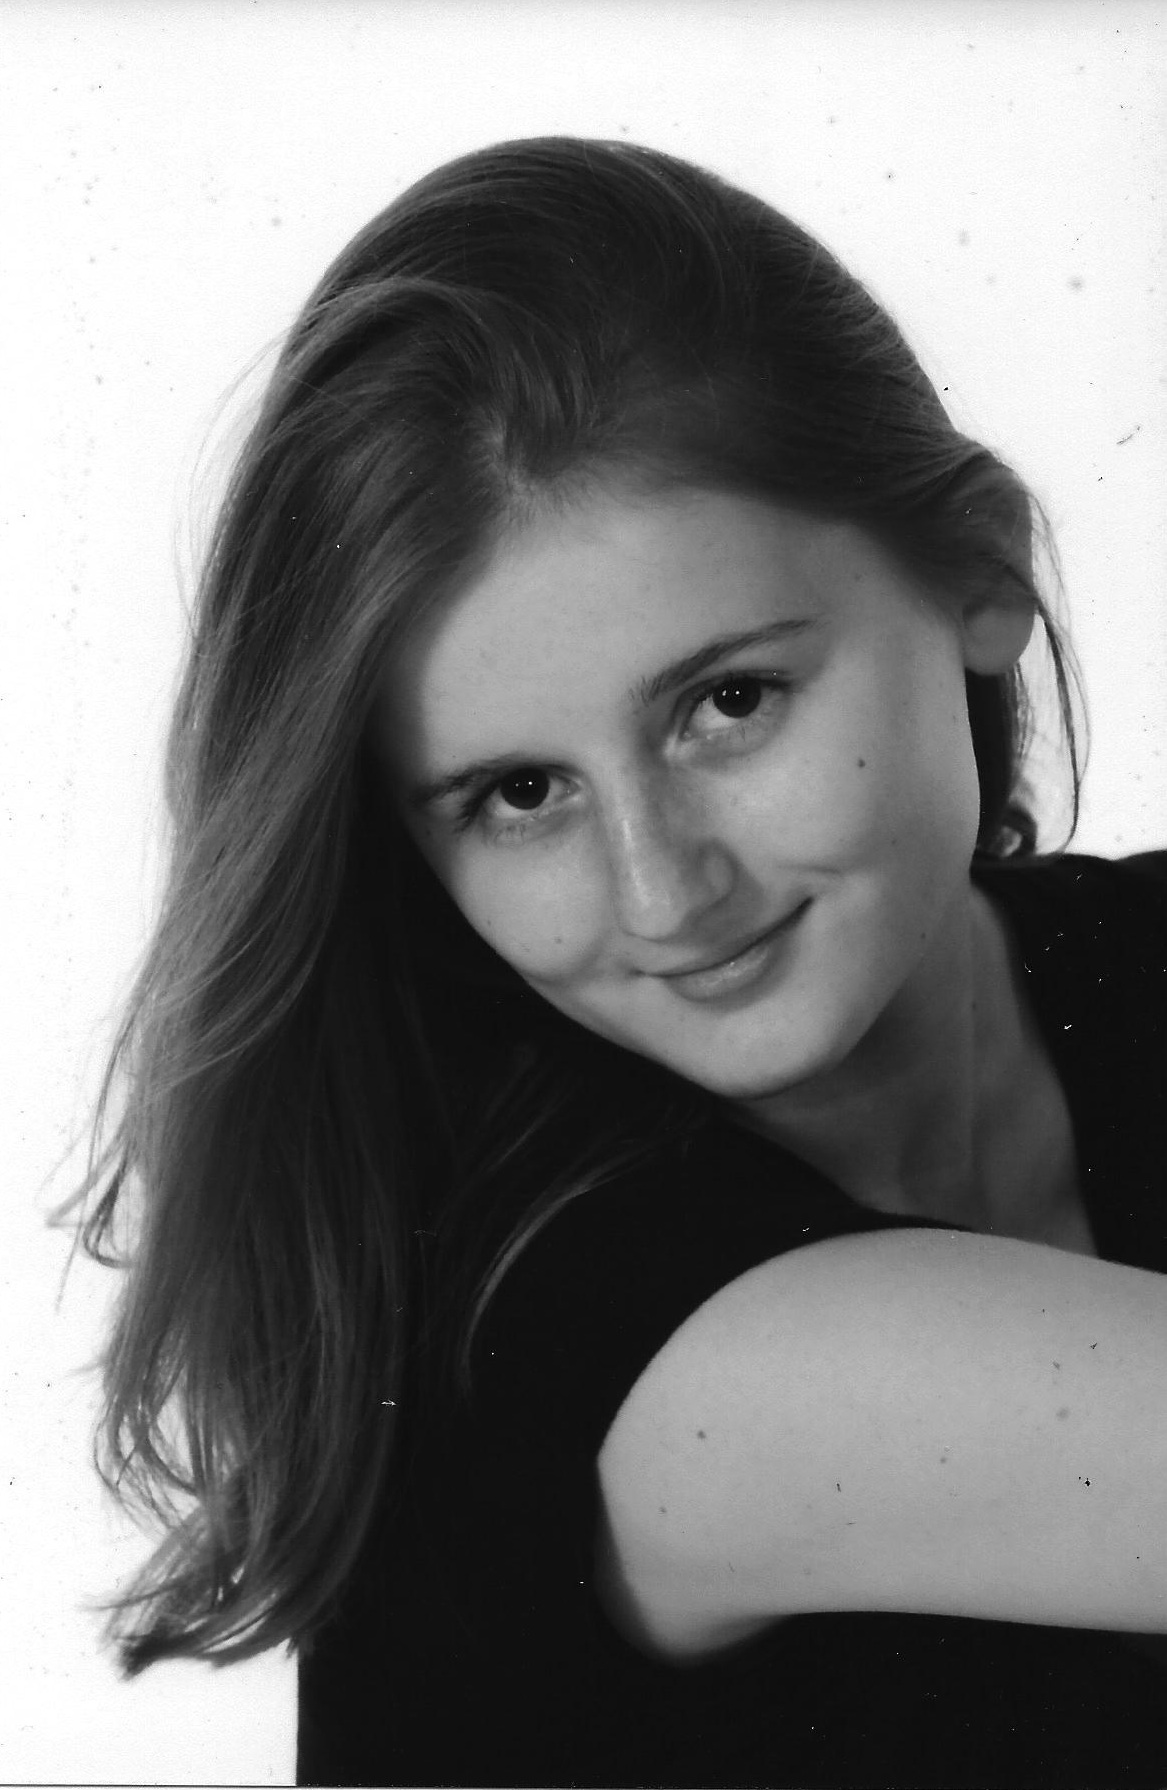 Jessica Bickel-Barlow